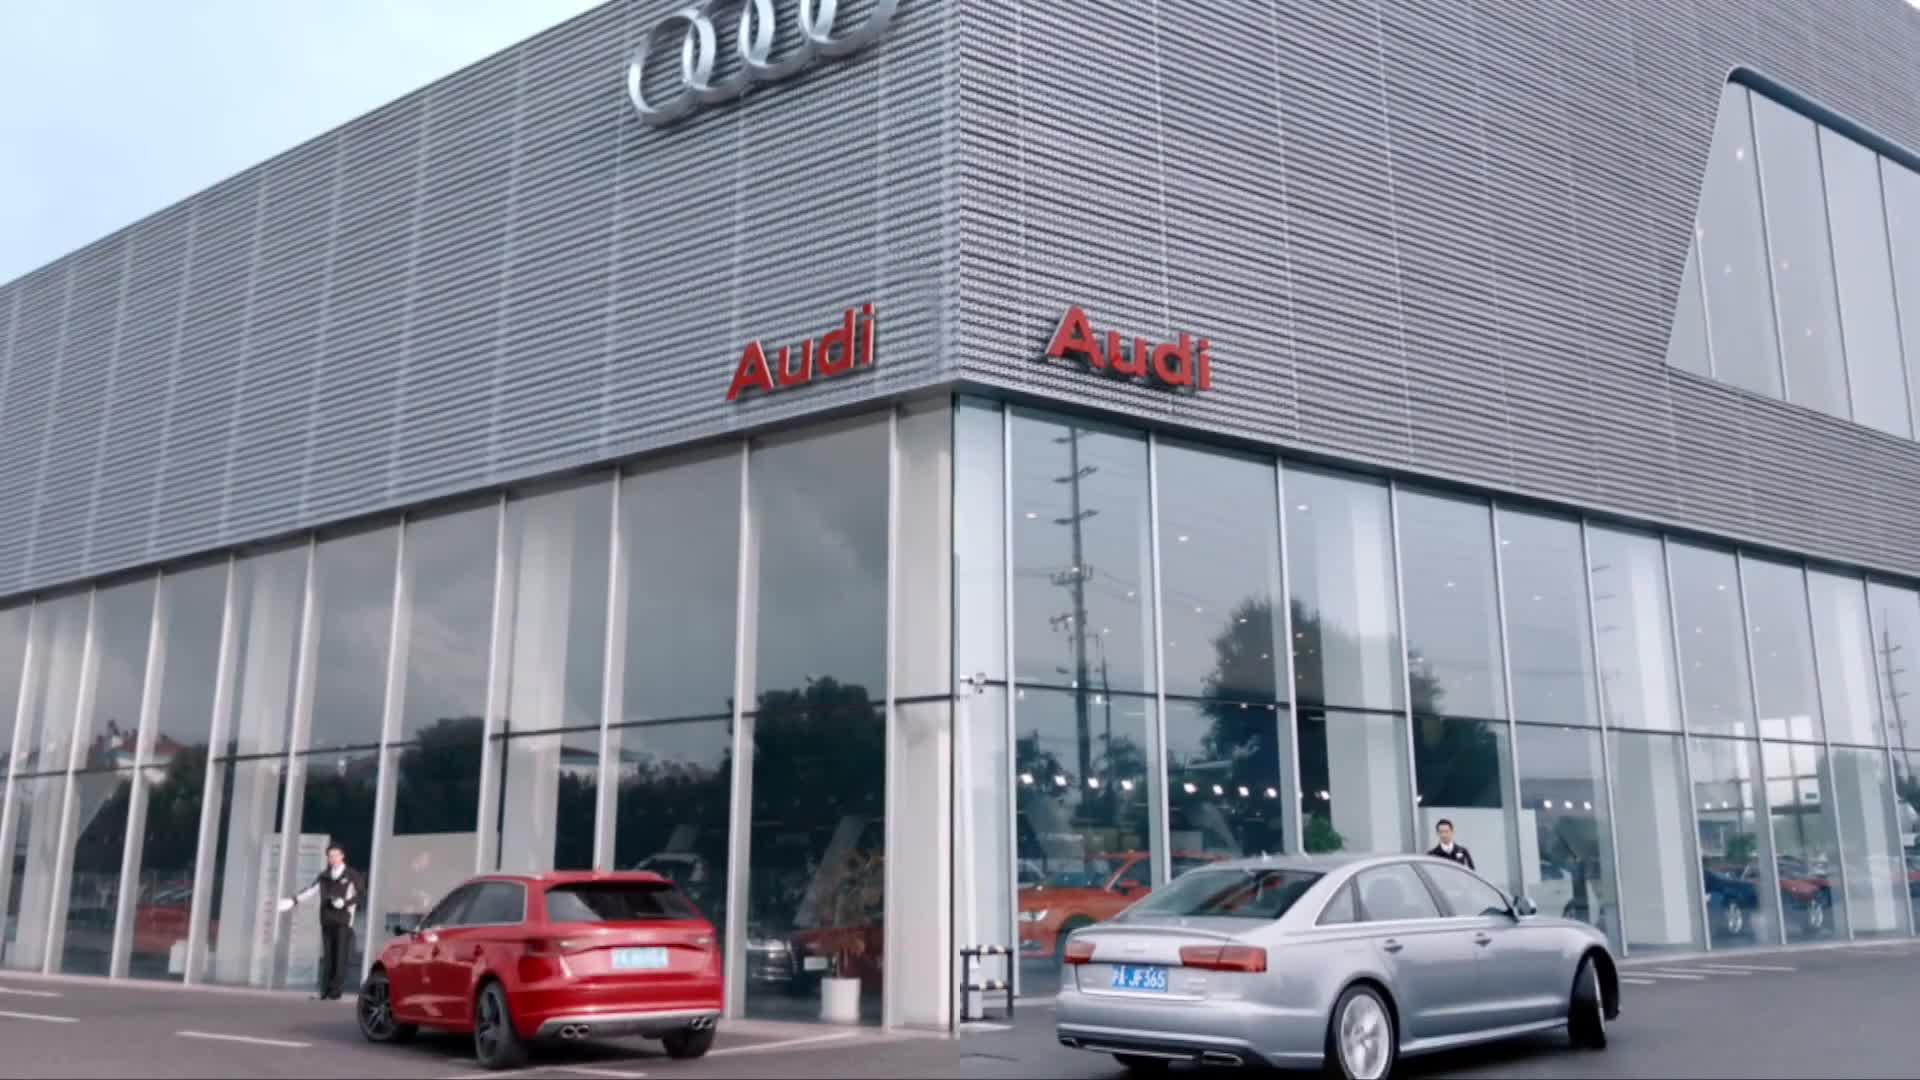 Audi奥迪汽车 《情感篇》